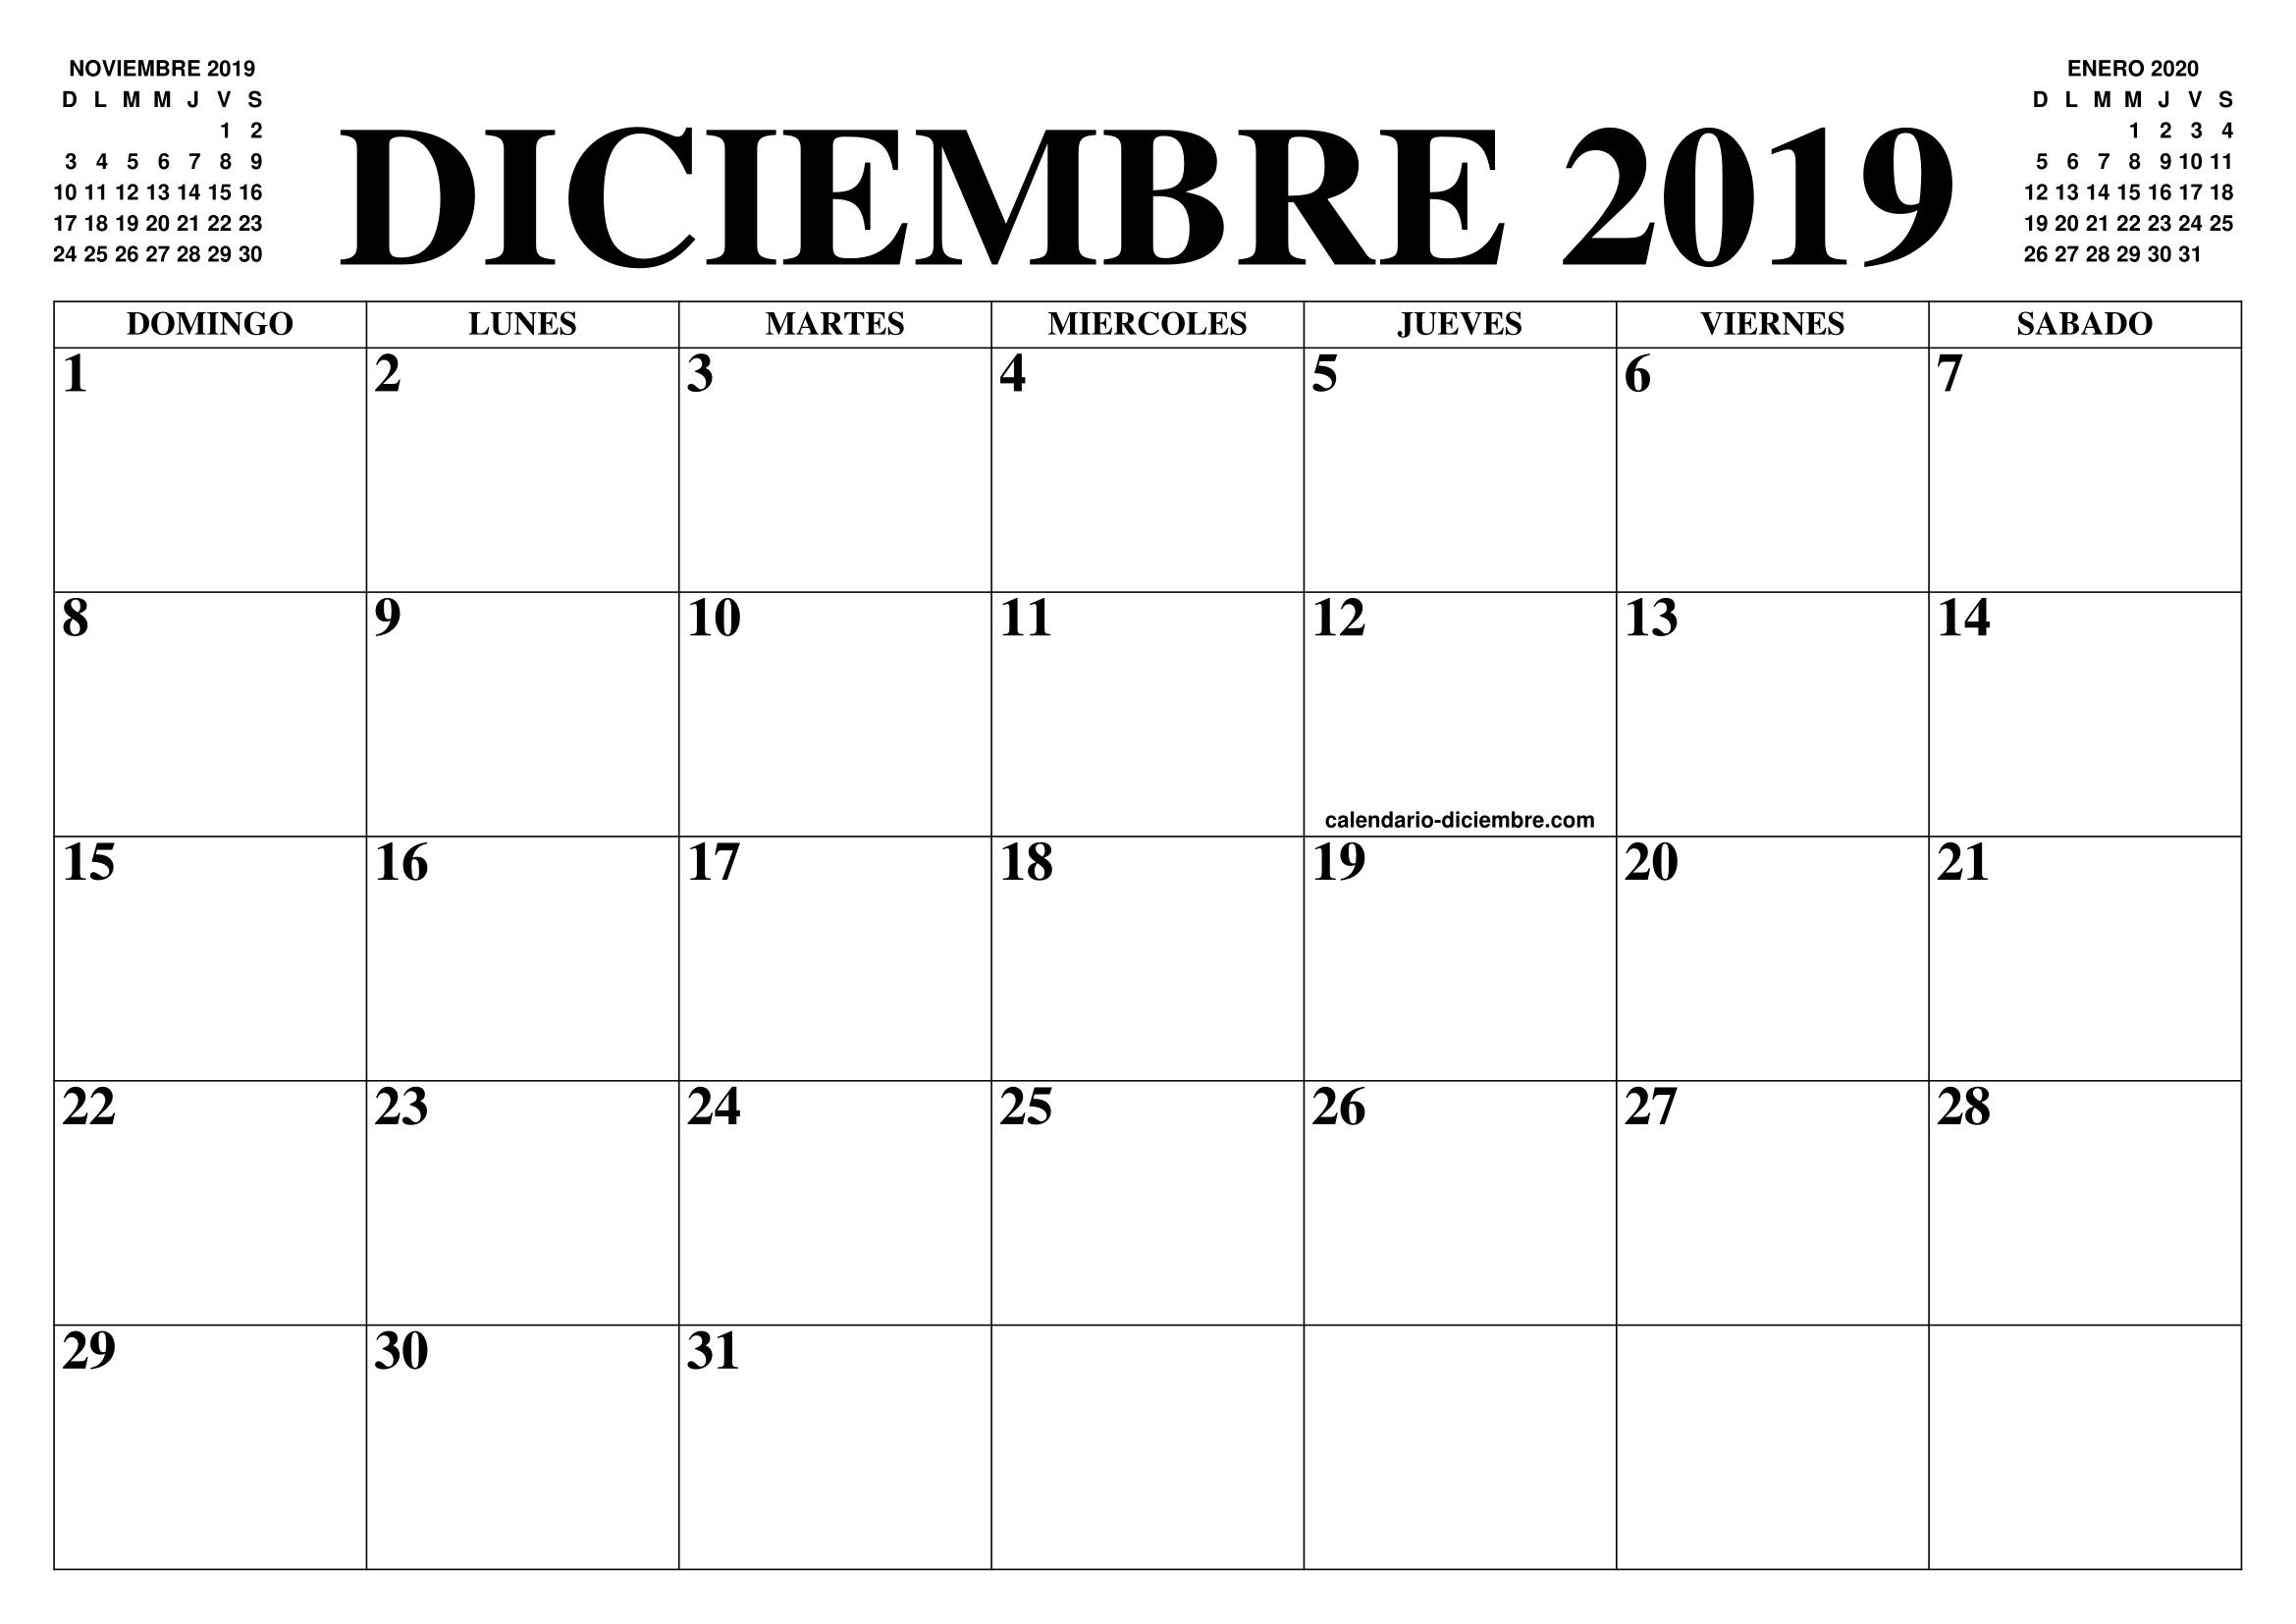 Calendario Diciembre 2019 Para Imprimir Pdf.Calendario Diciembre 2019 2020 El Calendario Diciembre